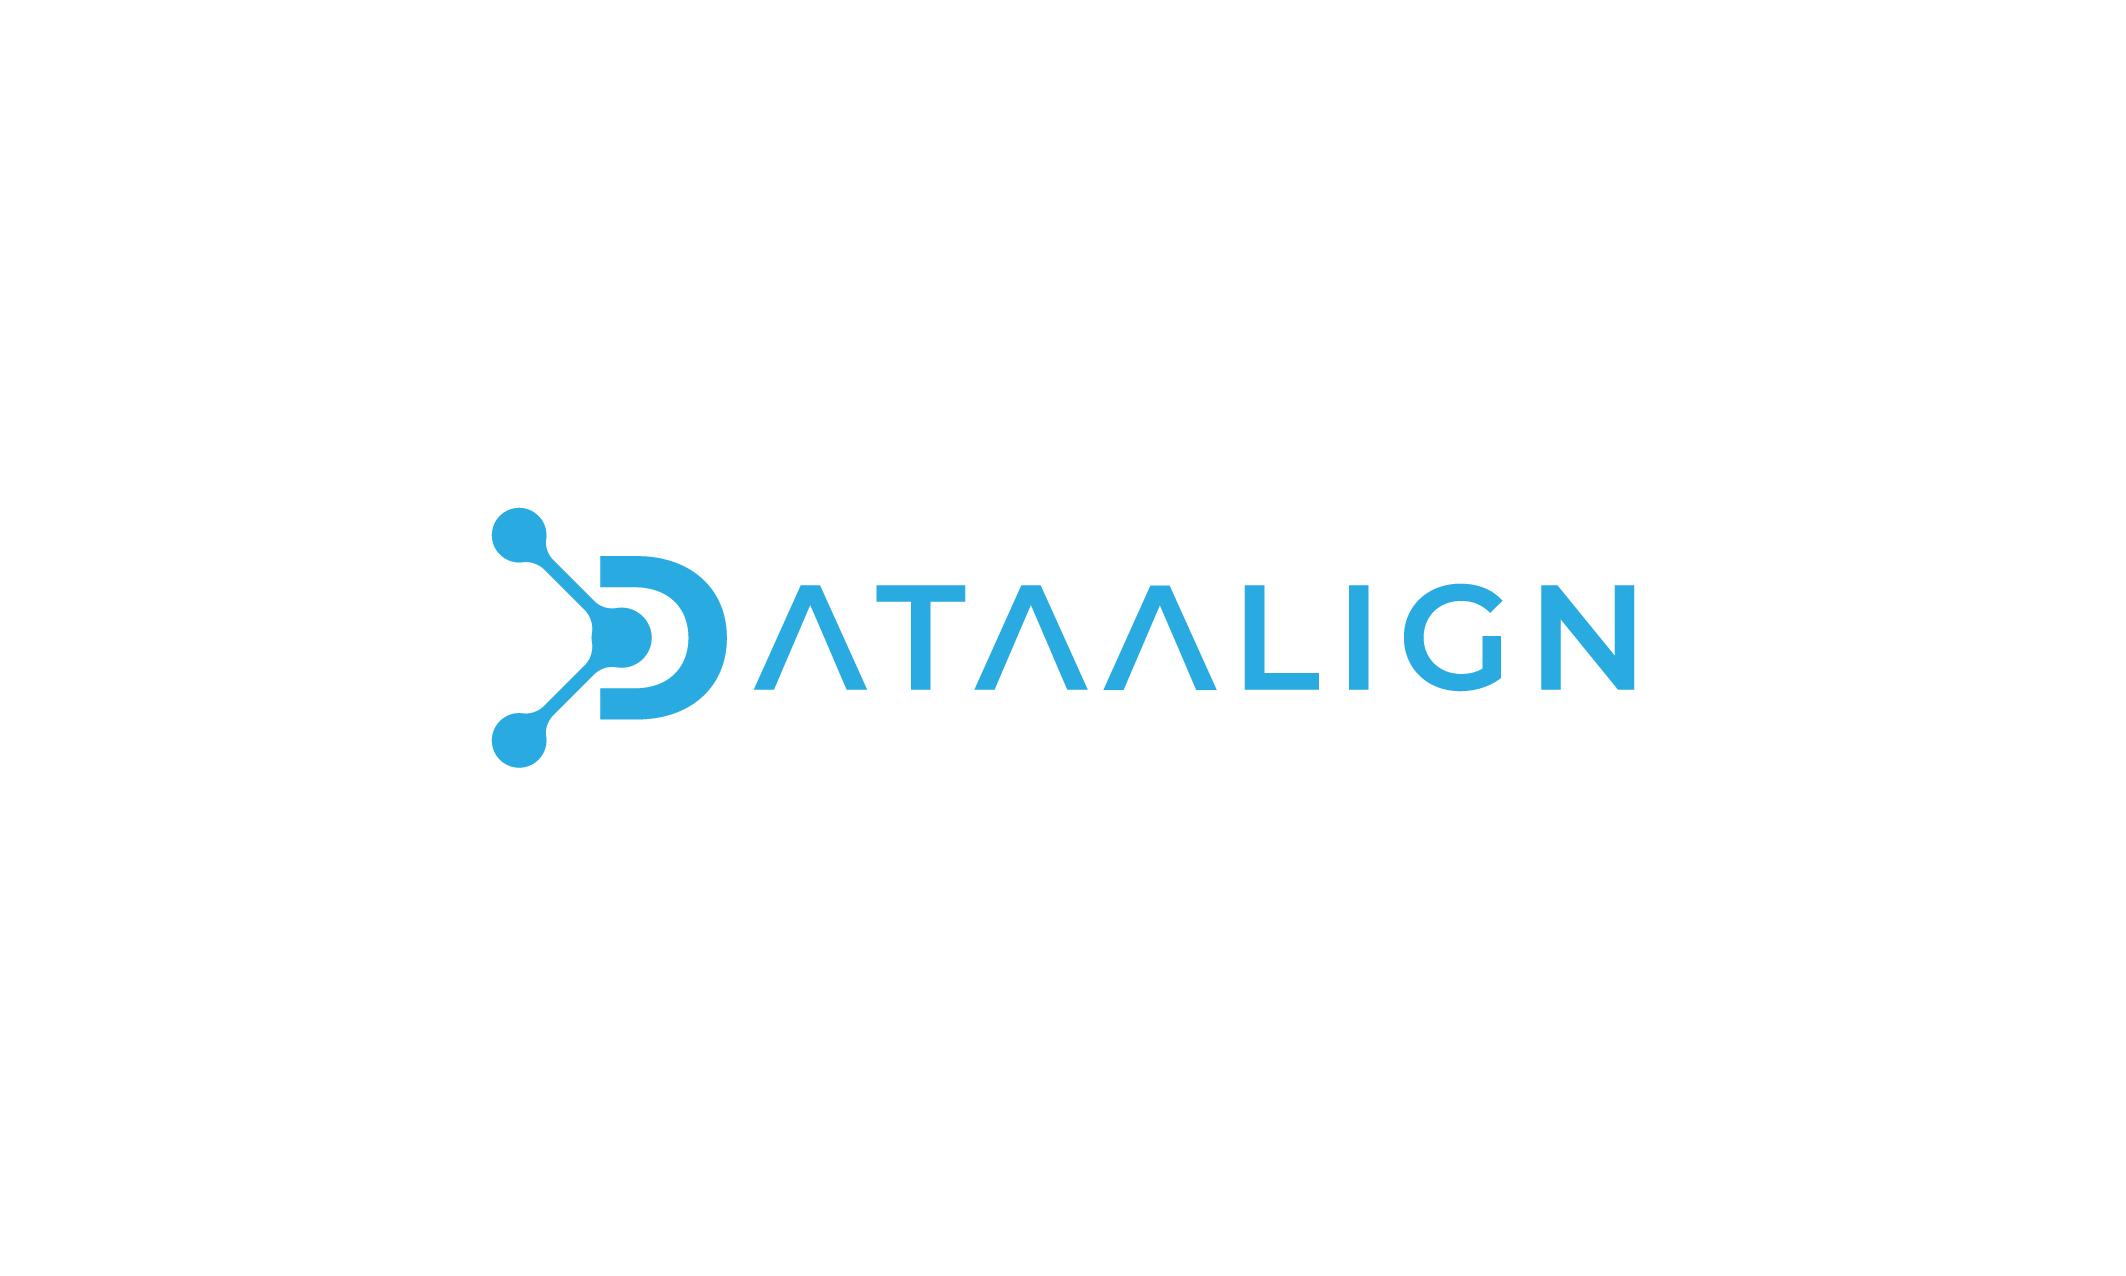 DataAlign.com